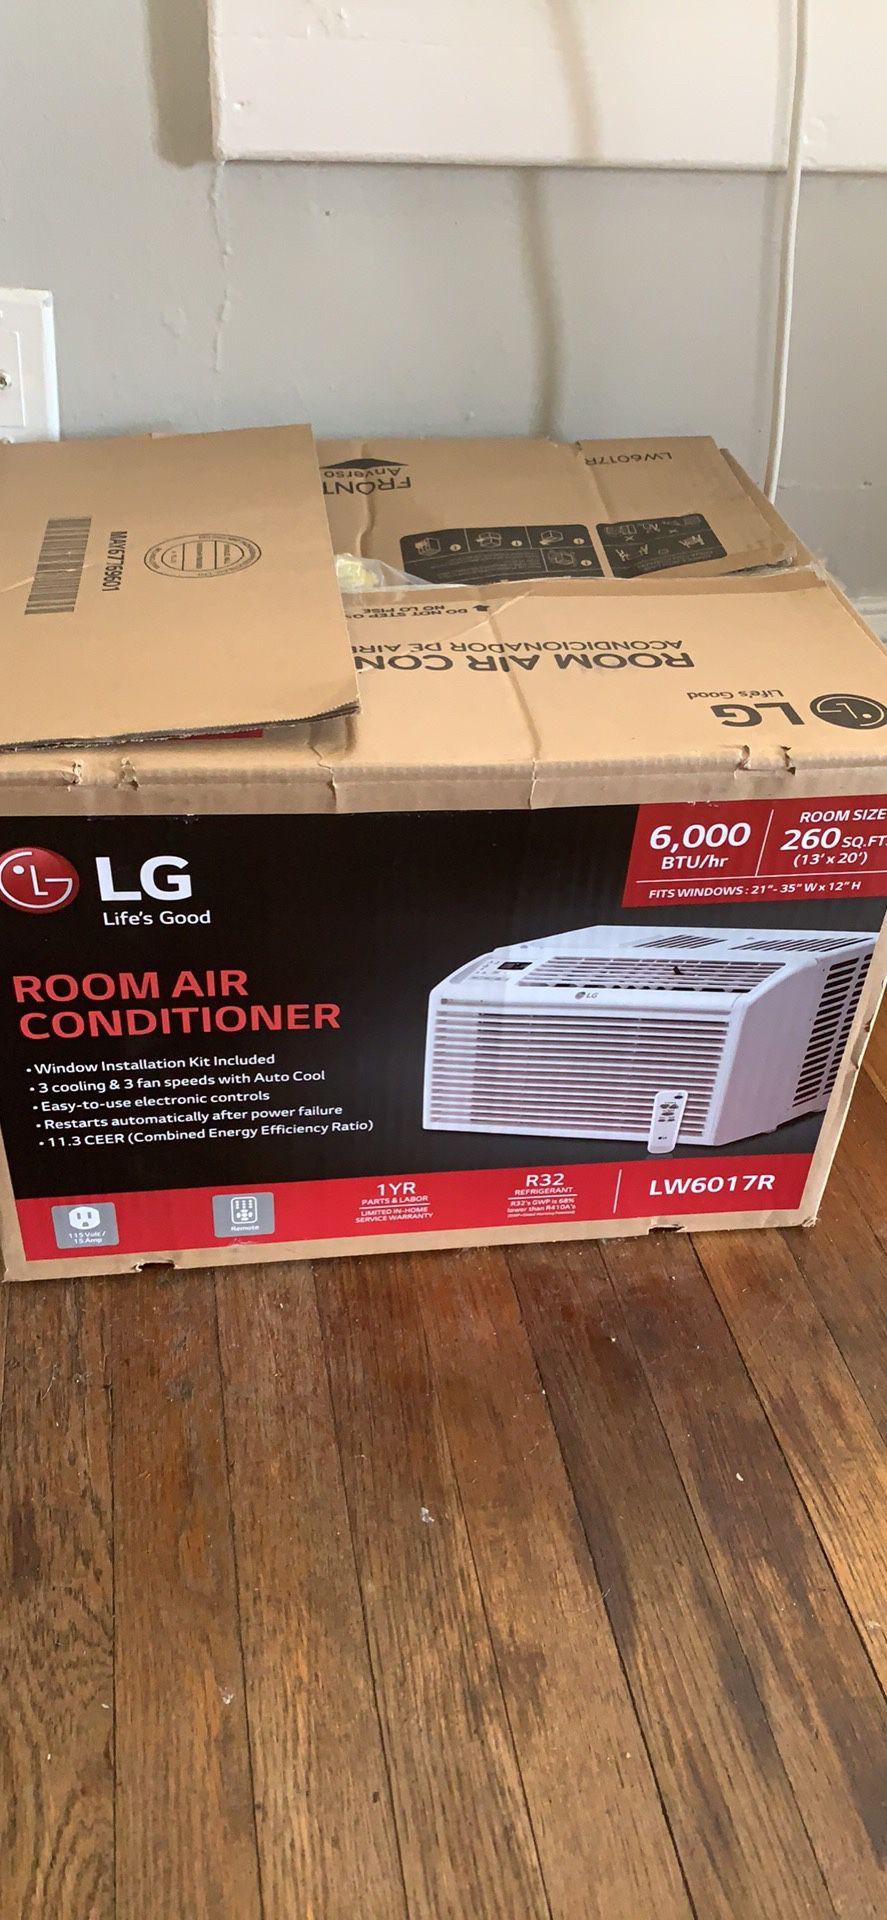 Window air conditioner AC air conditioning unit 6,000 btu Energy star. Dehumidifier MOVING SOON a/c